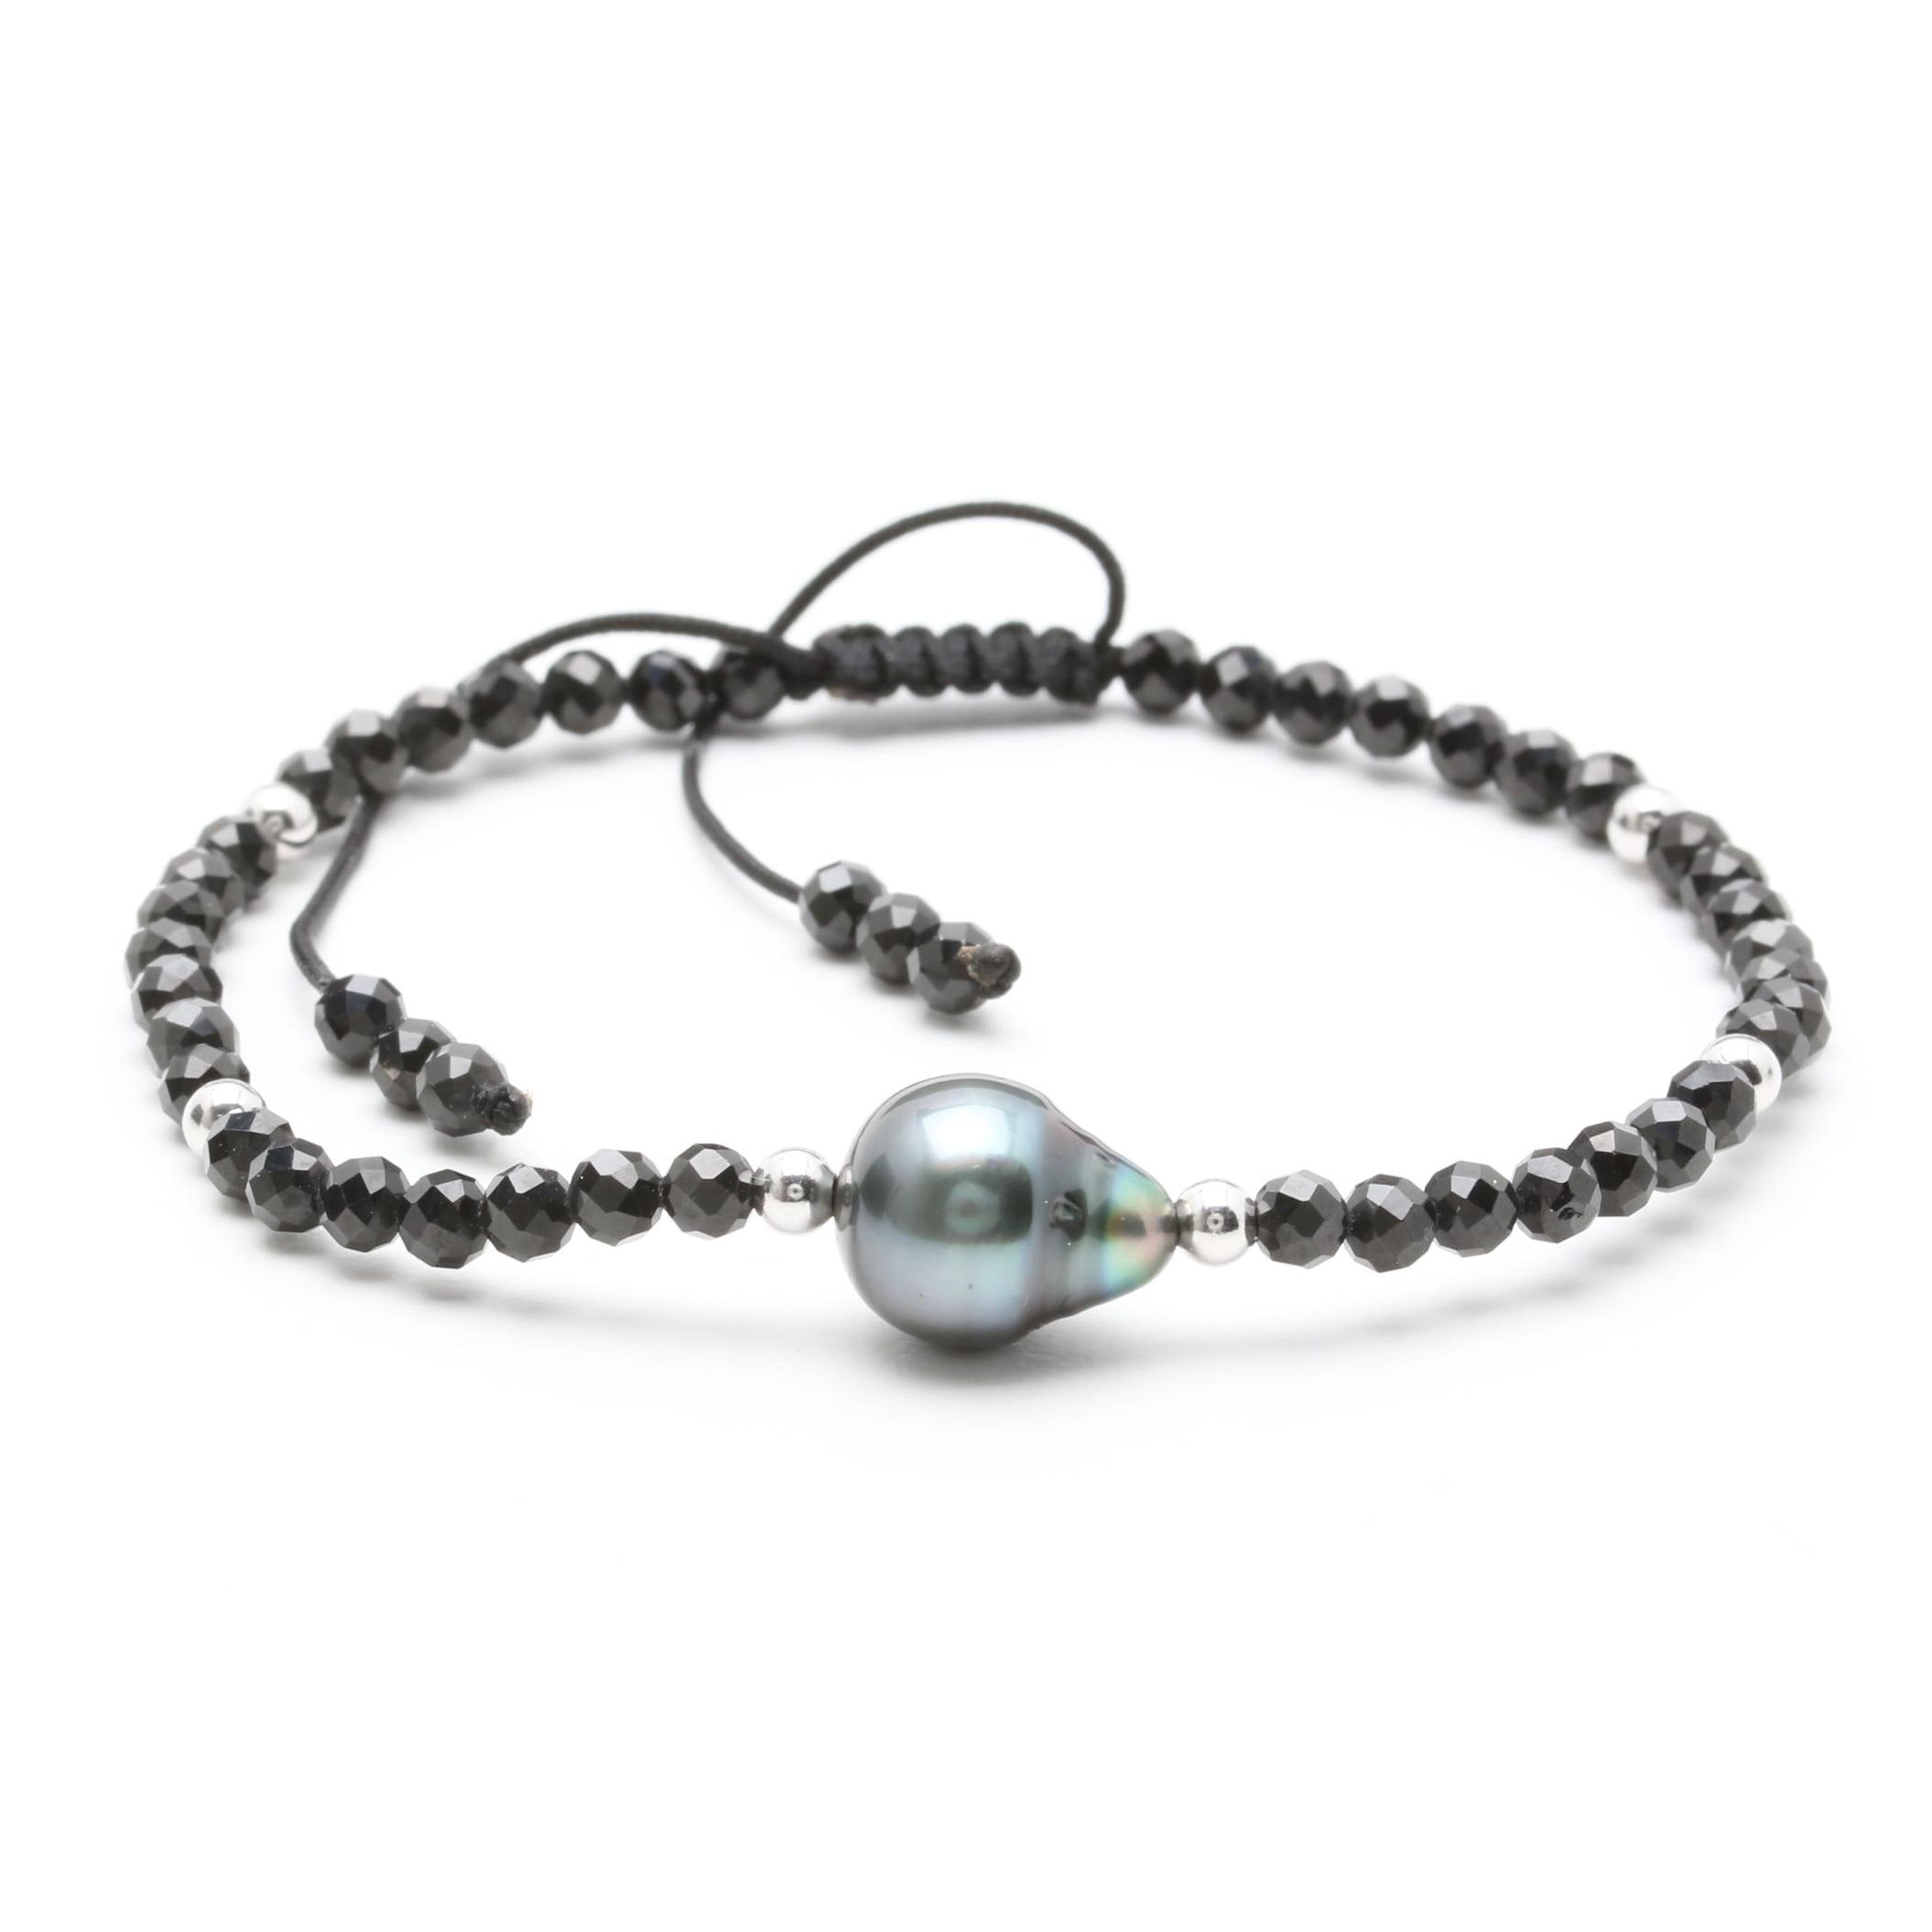 Cultured Pearl and Black Onyx Adjustable Beaded Bracelet